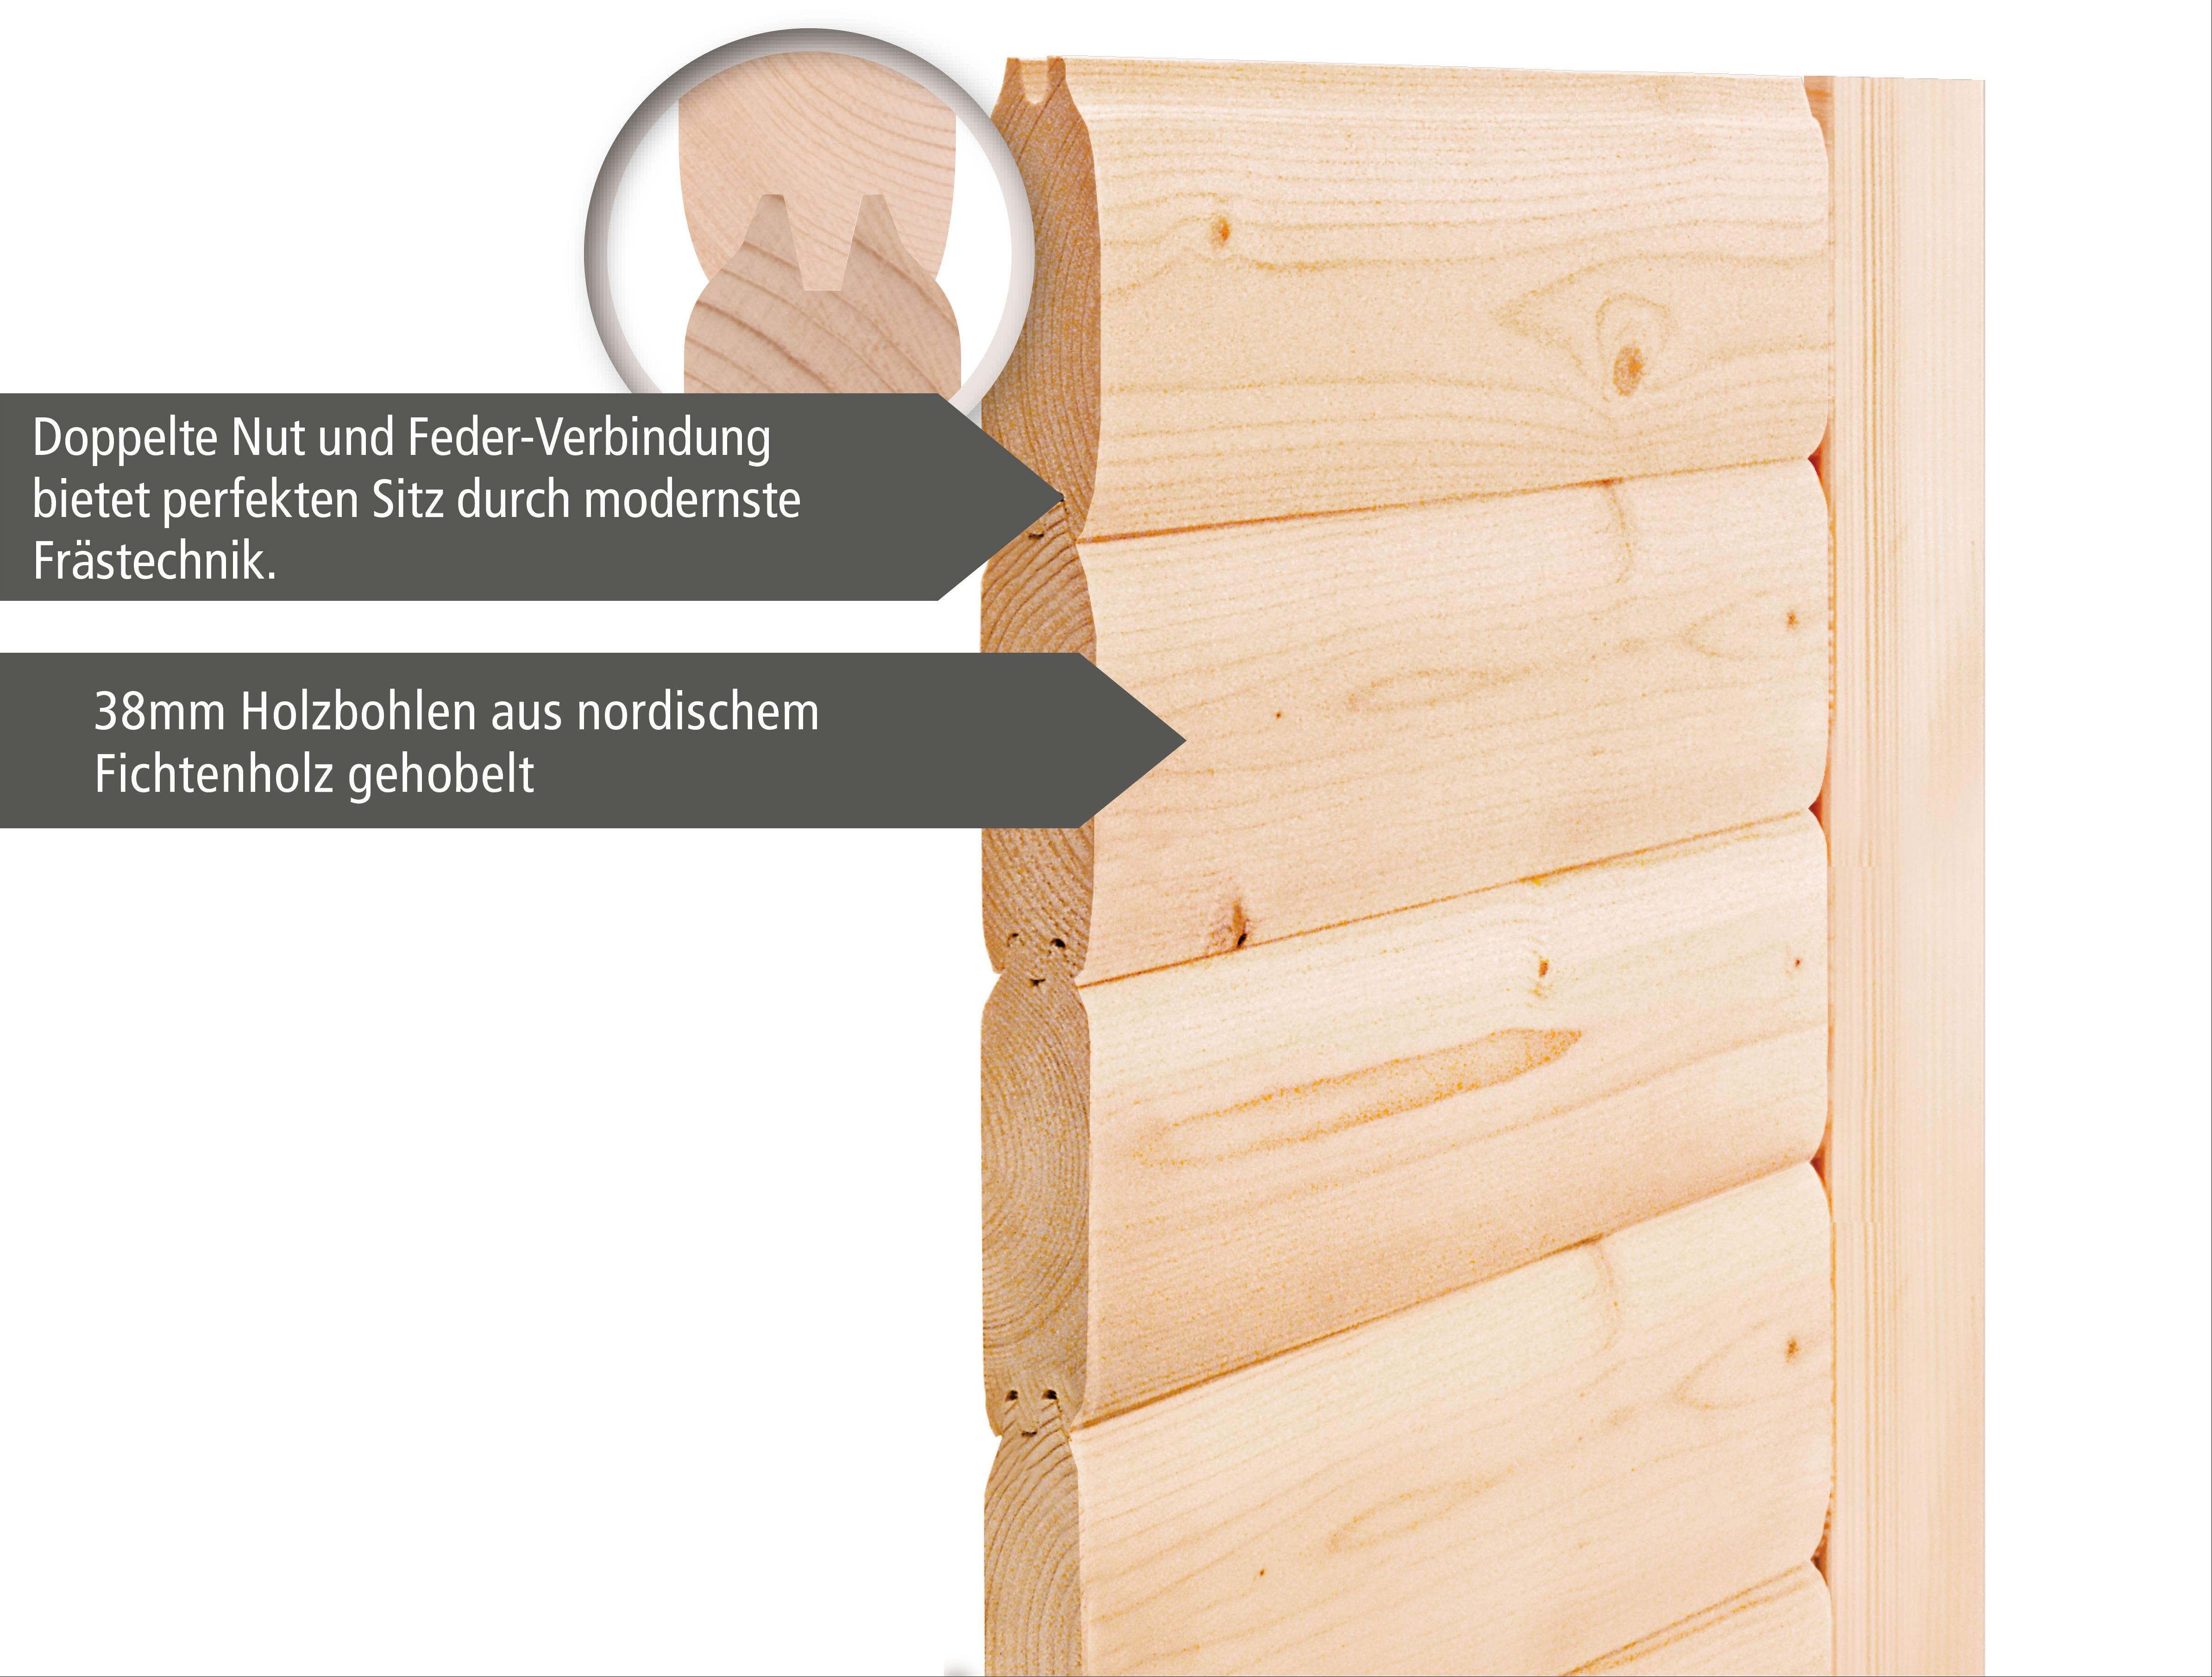 Woodfeeling Sauna Karla 38mm Kranz Ofen 9kW intern Tür Klarglas Bild 5